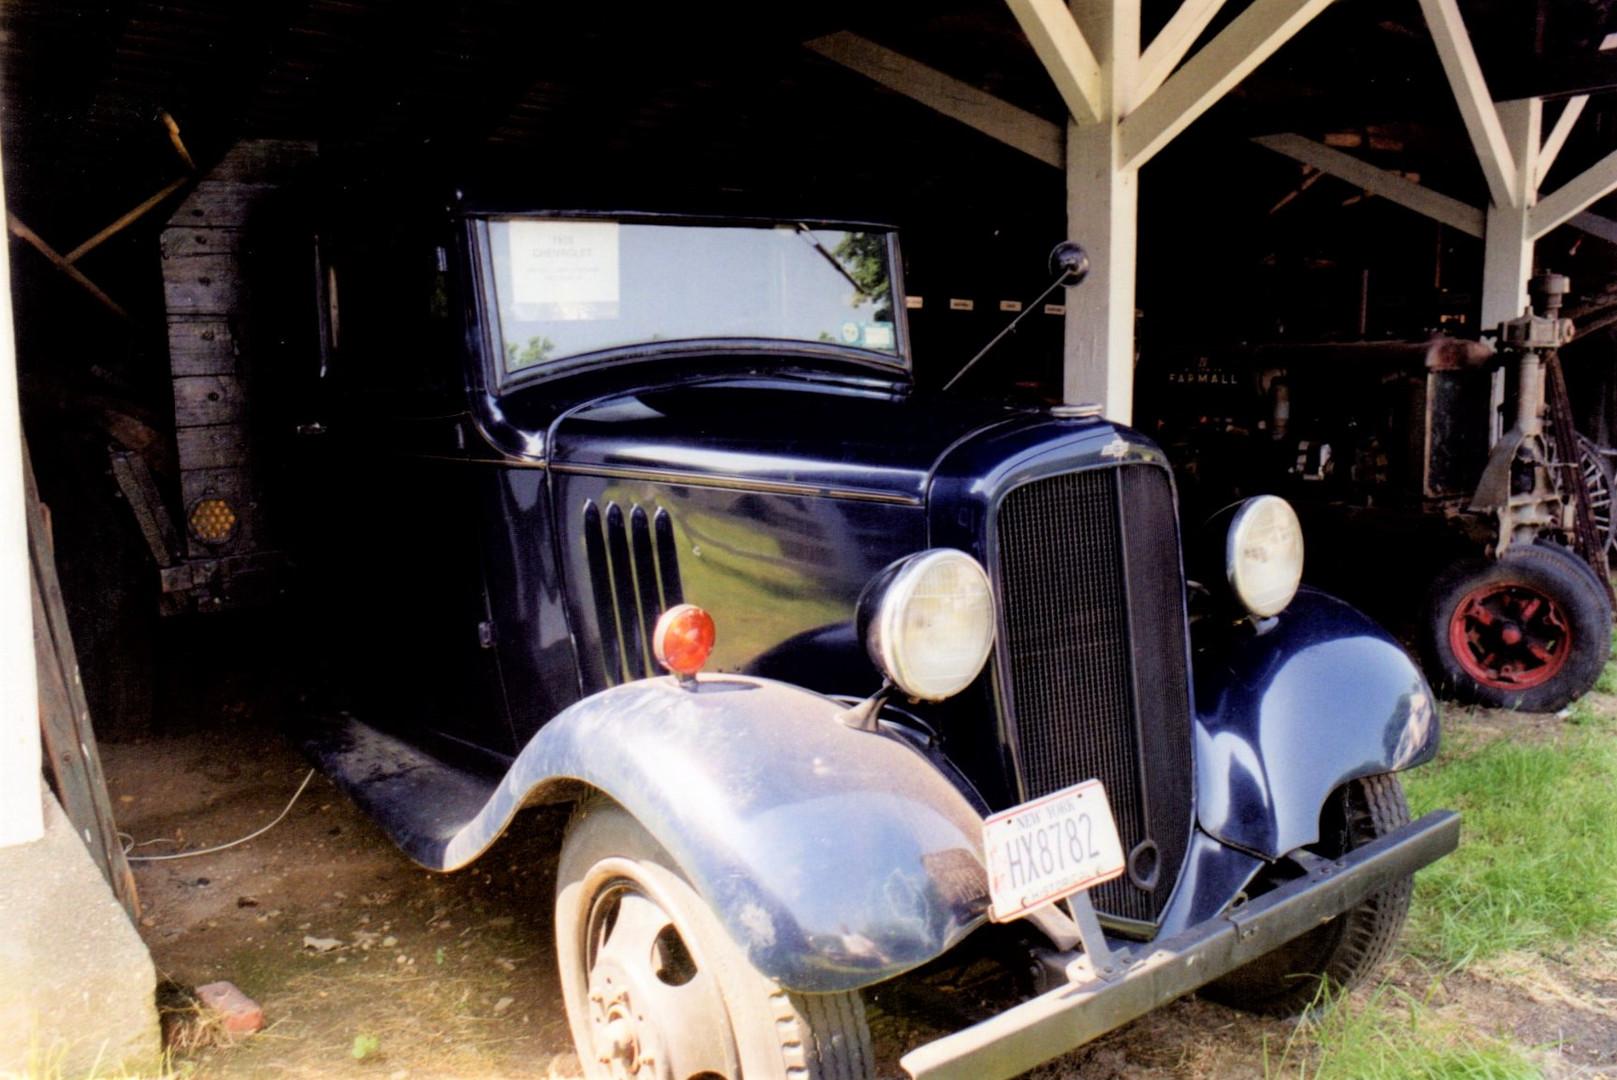 Ron Bush's 1935 Chevrolet flatbed